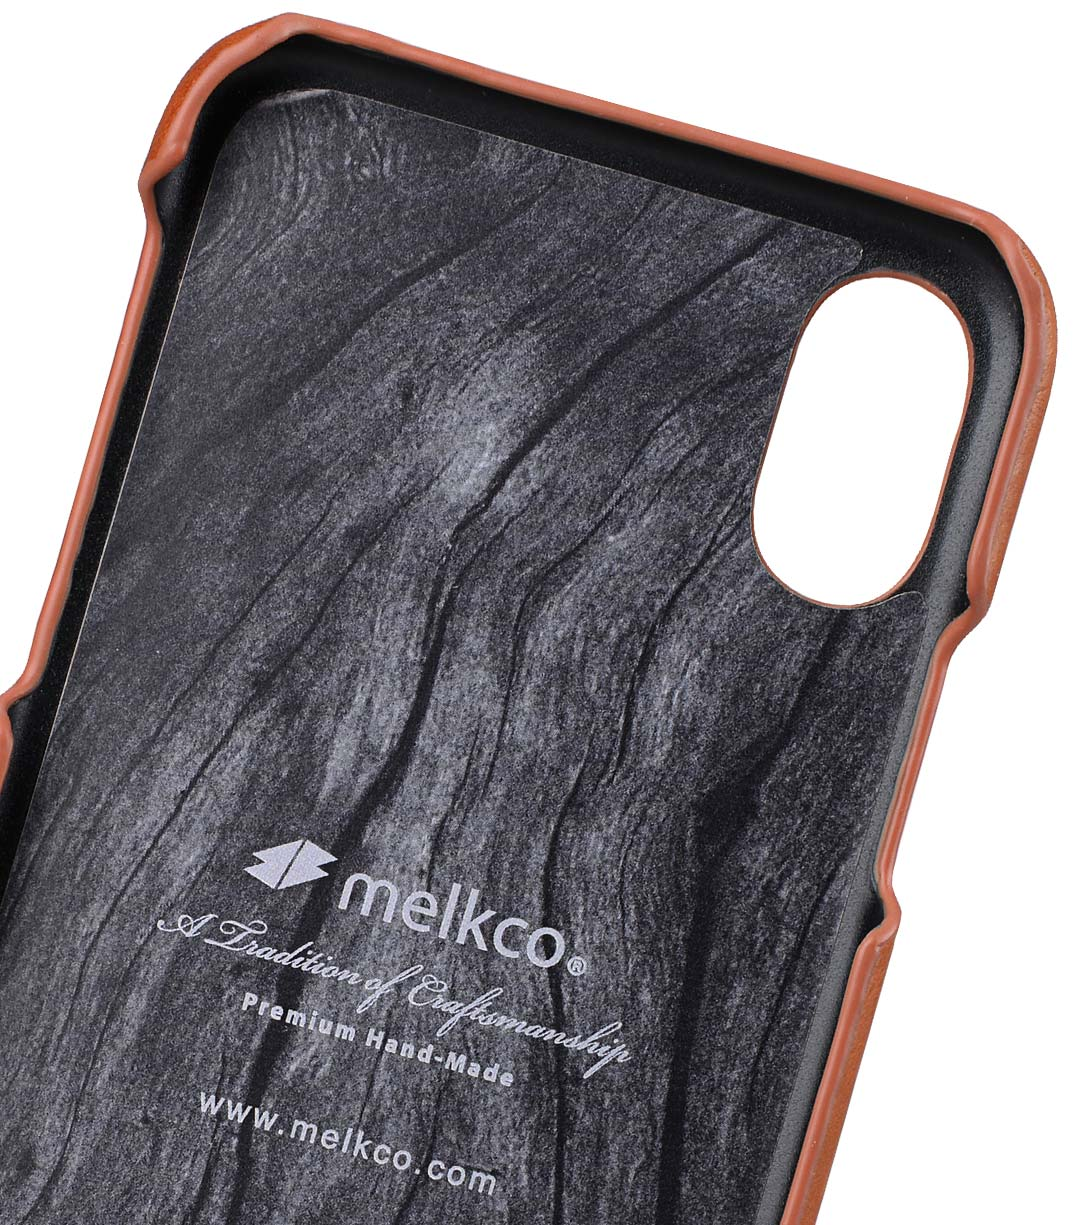 Melkco iPhone X  (2017) レザーケース プレミアム 本革レザー 薄型 軽量 ハンドメイド  カードホルダー Ver.2 薄型 軽量 【 タン WF 】